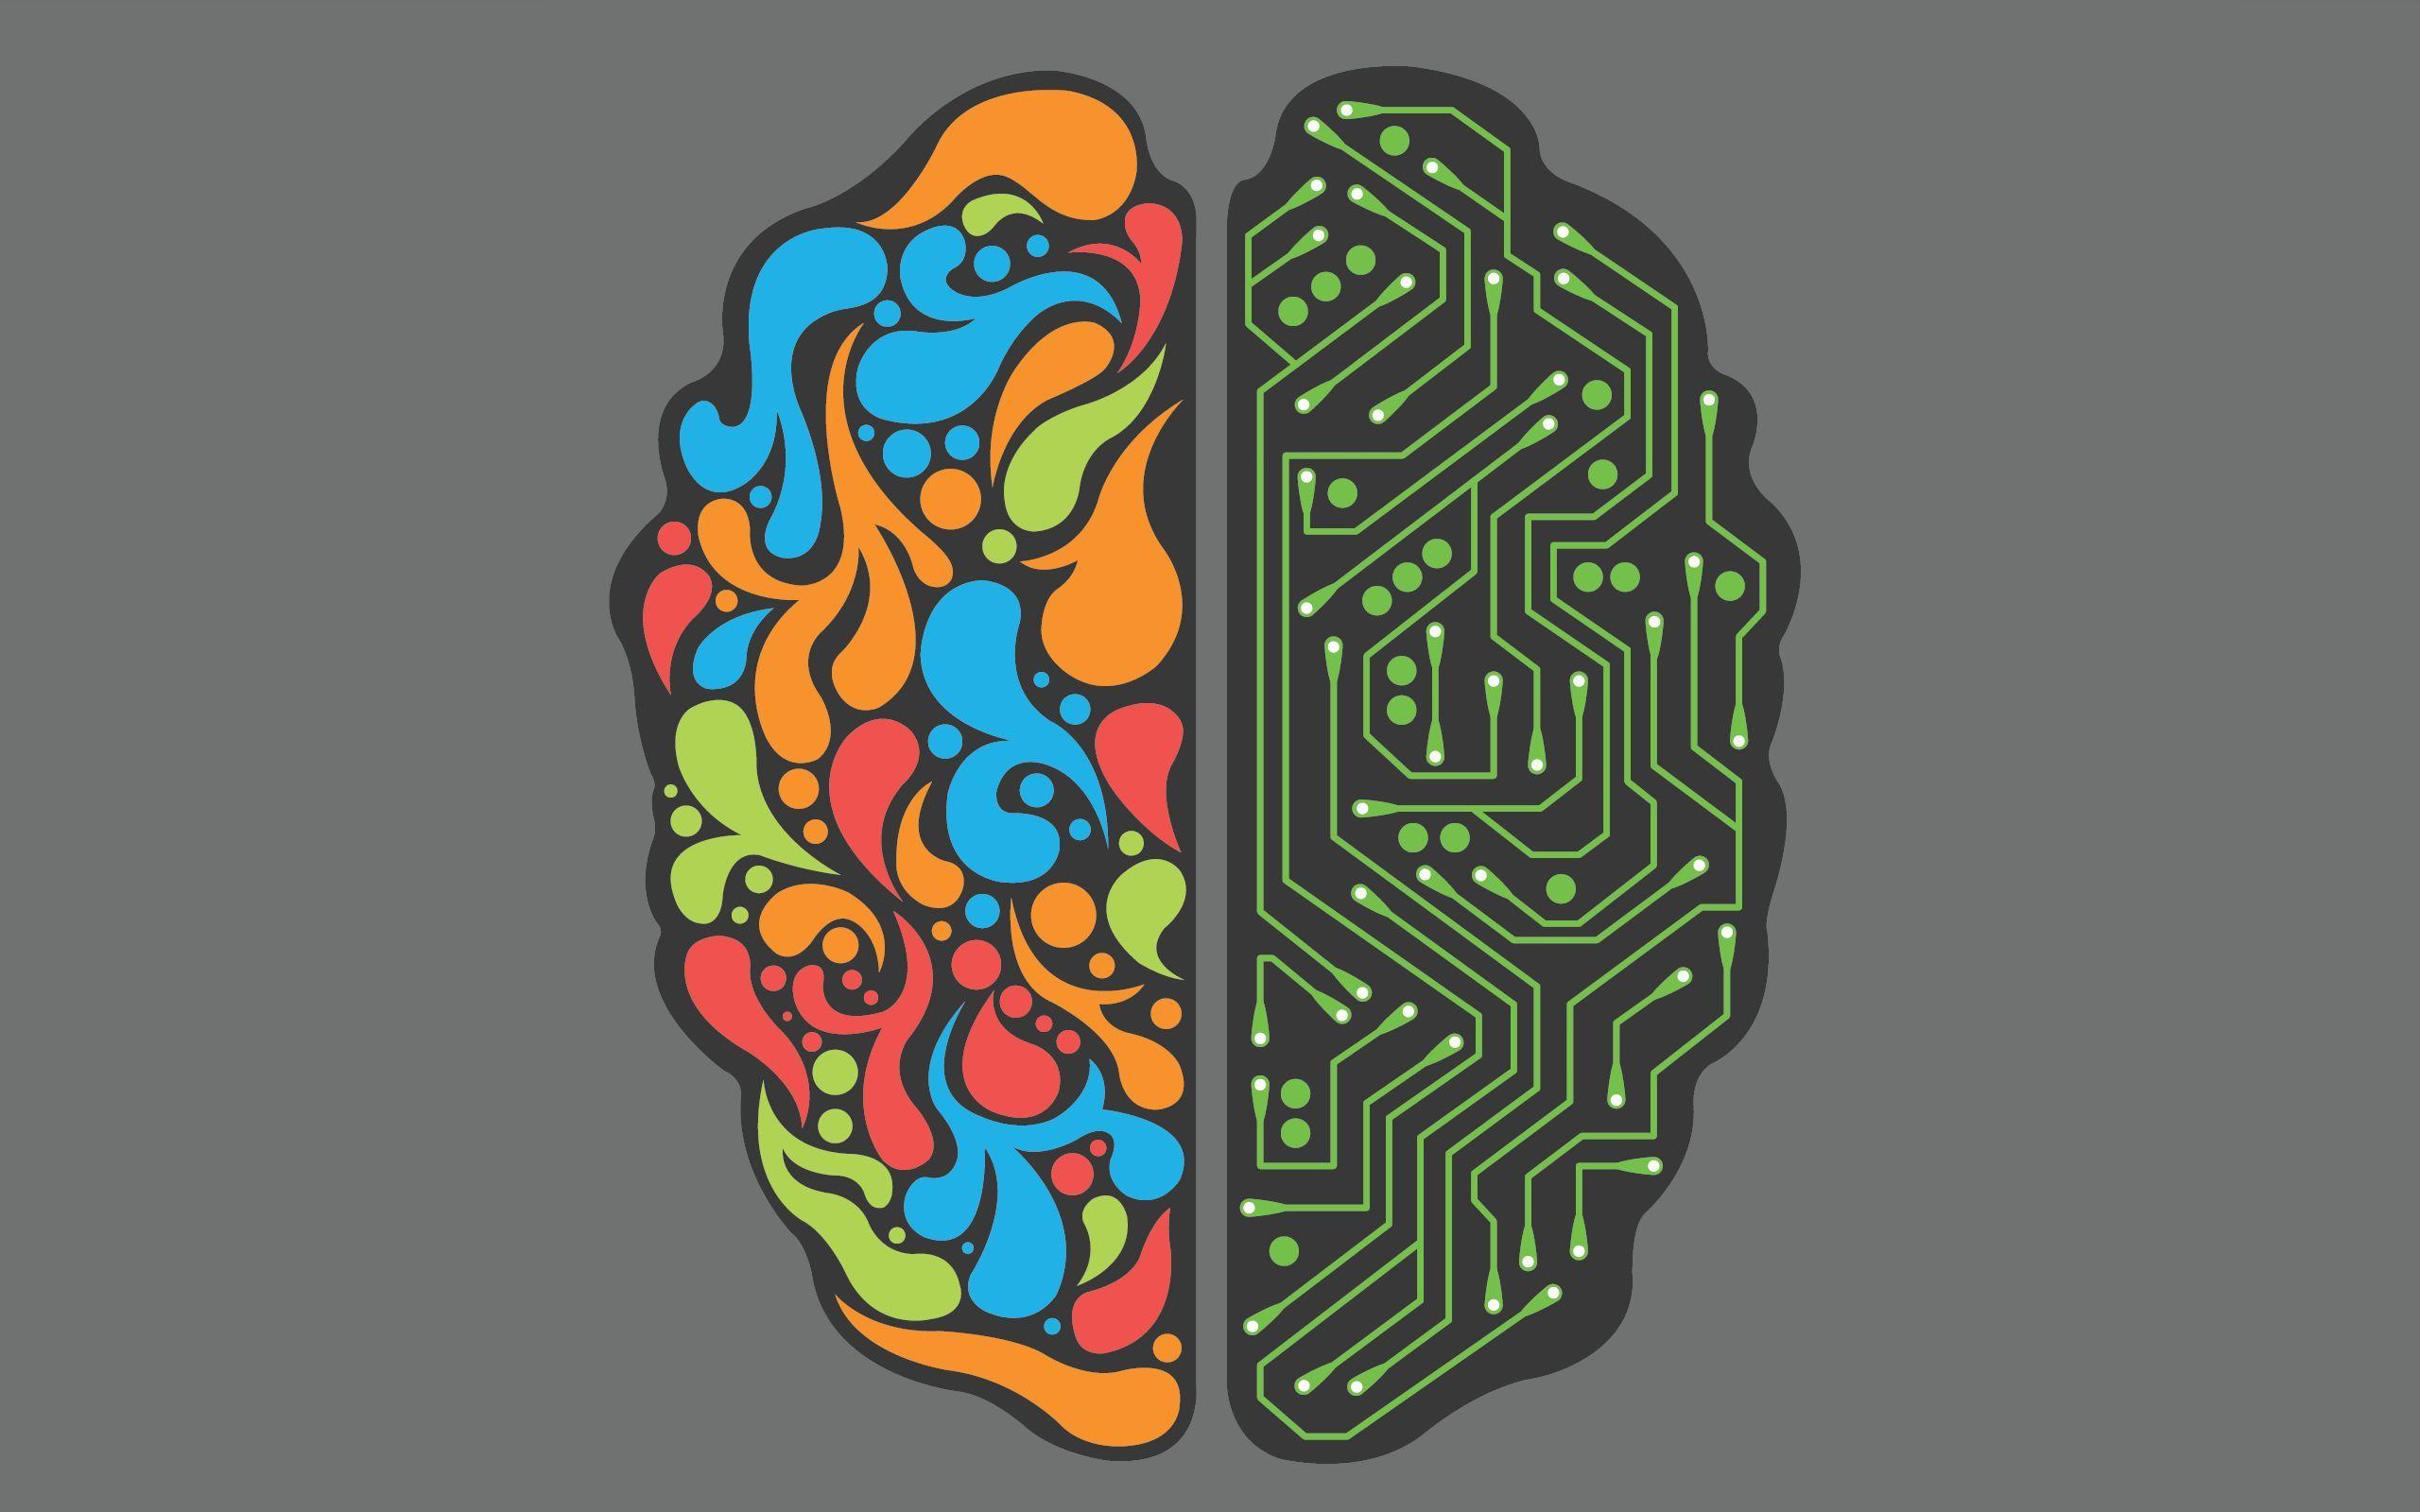 cerveau-de-geek